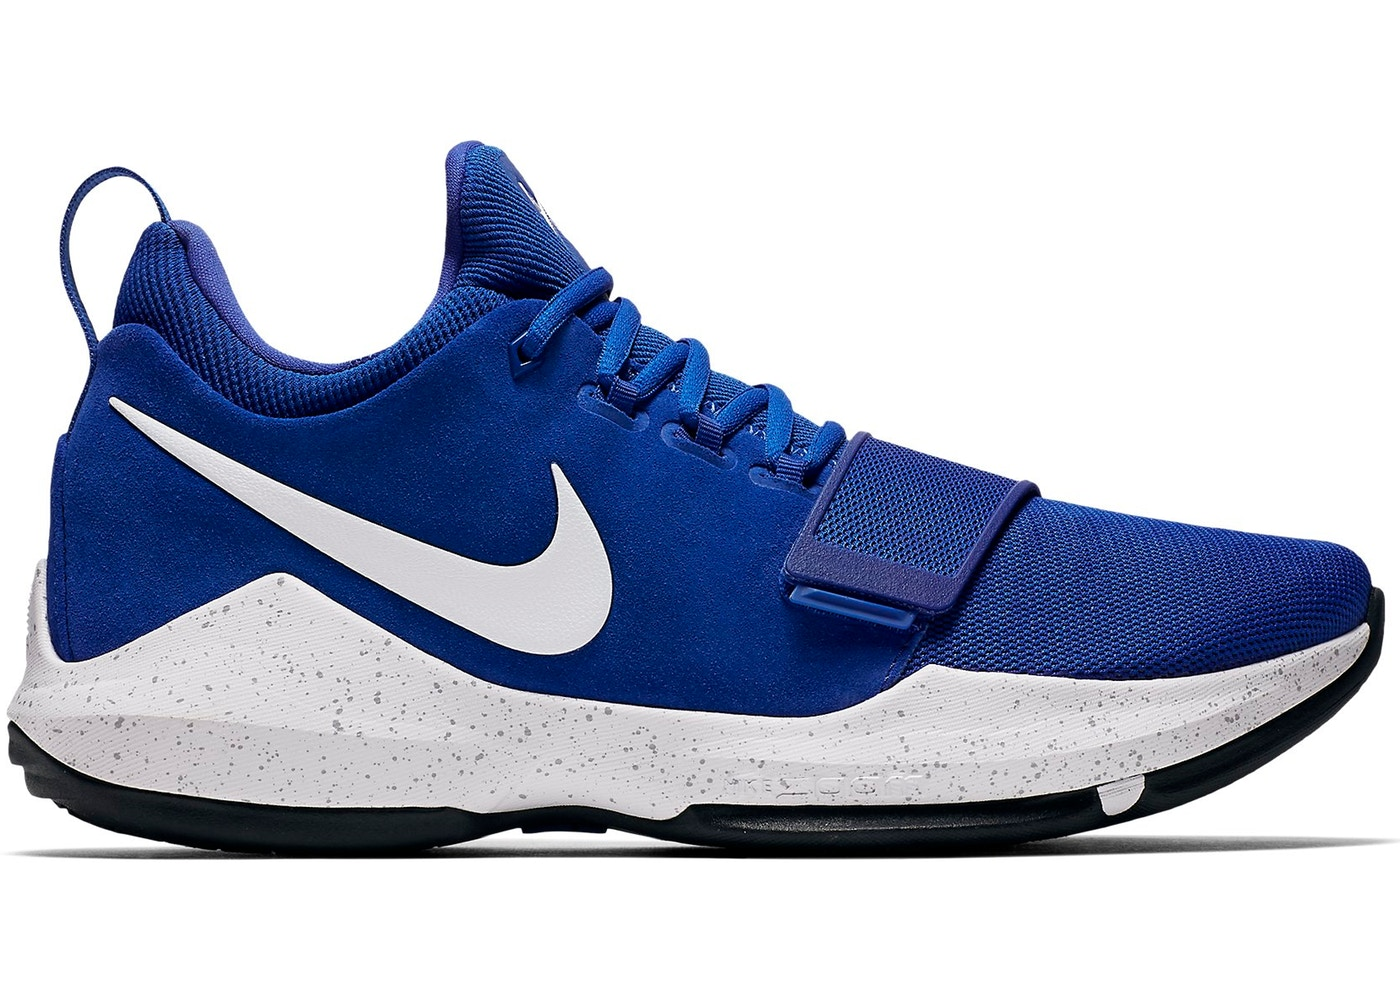 60160ed586efa Nike PG 1 Game Royal - 878627-400